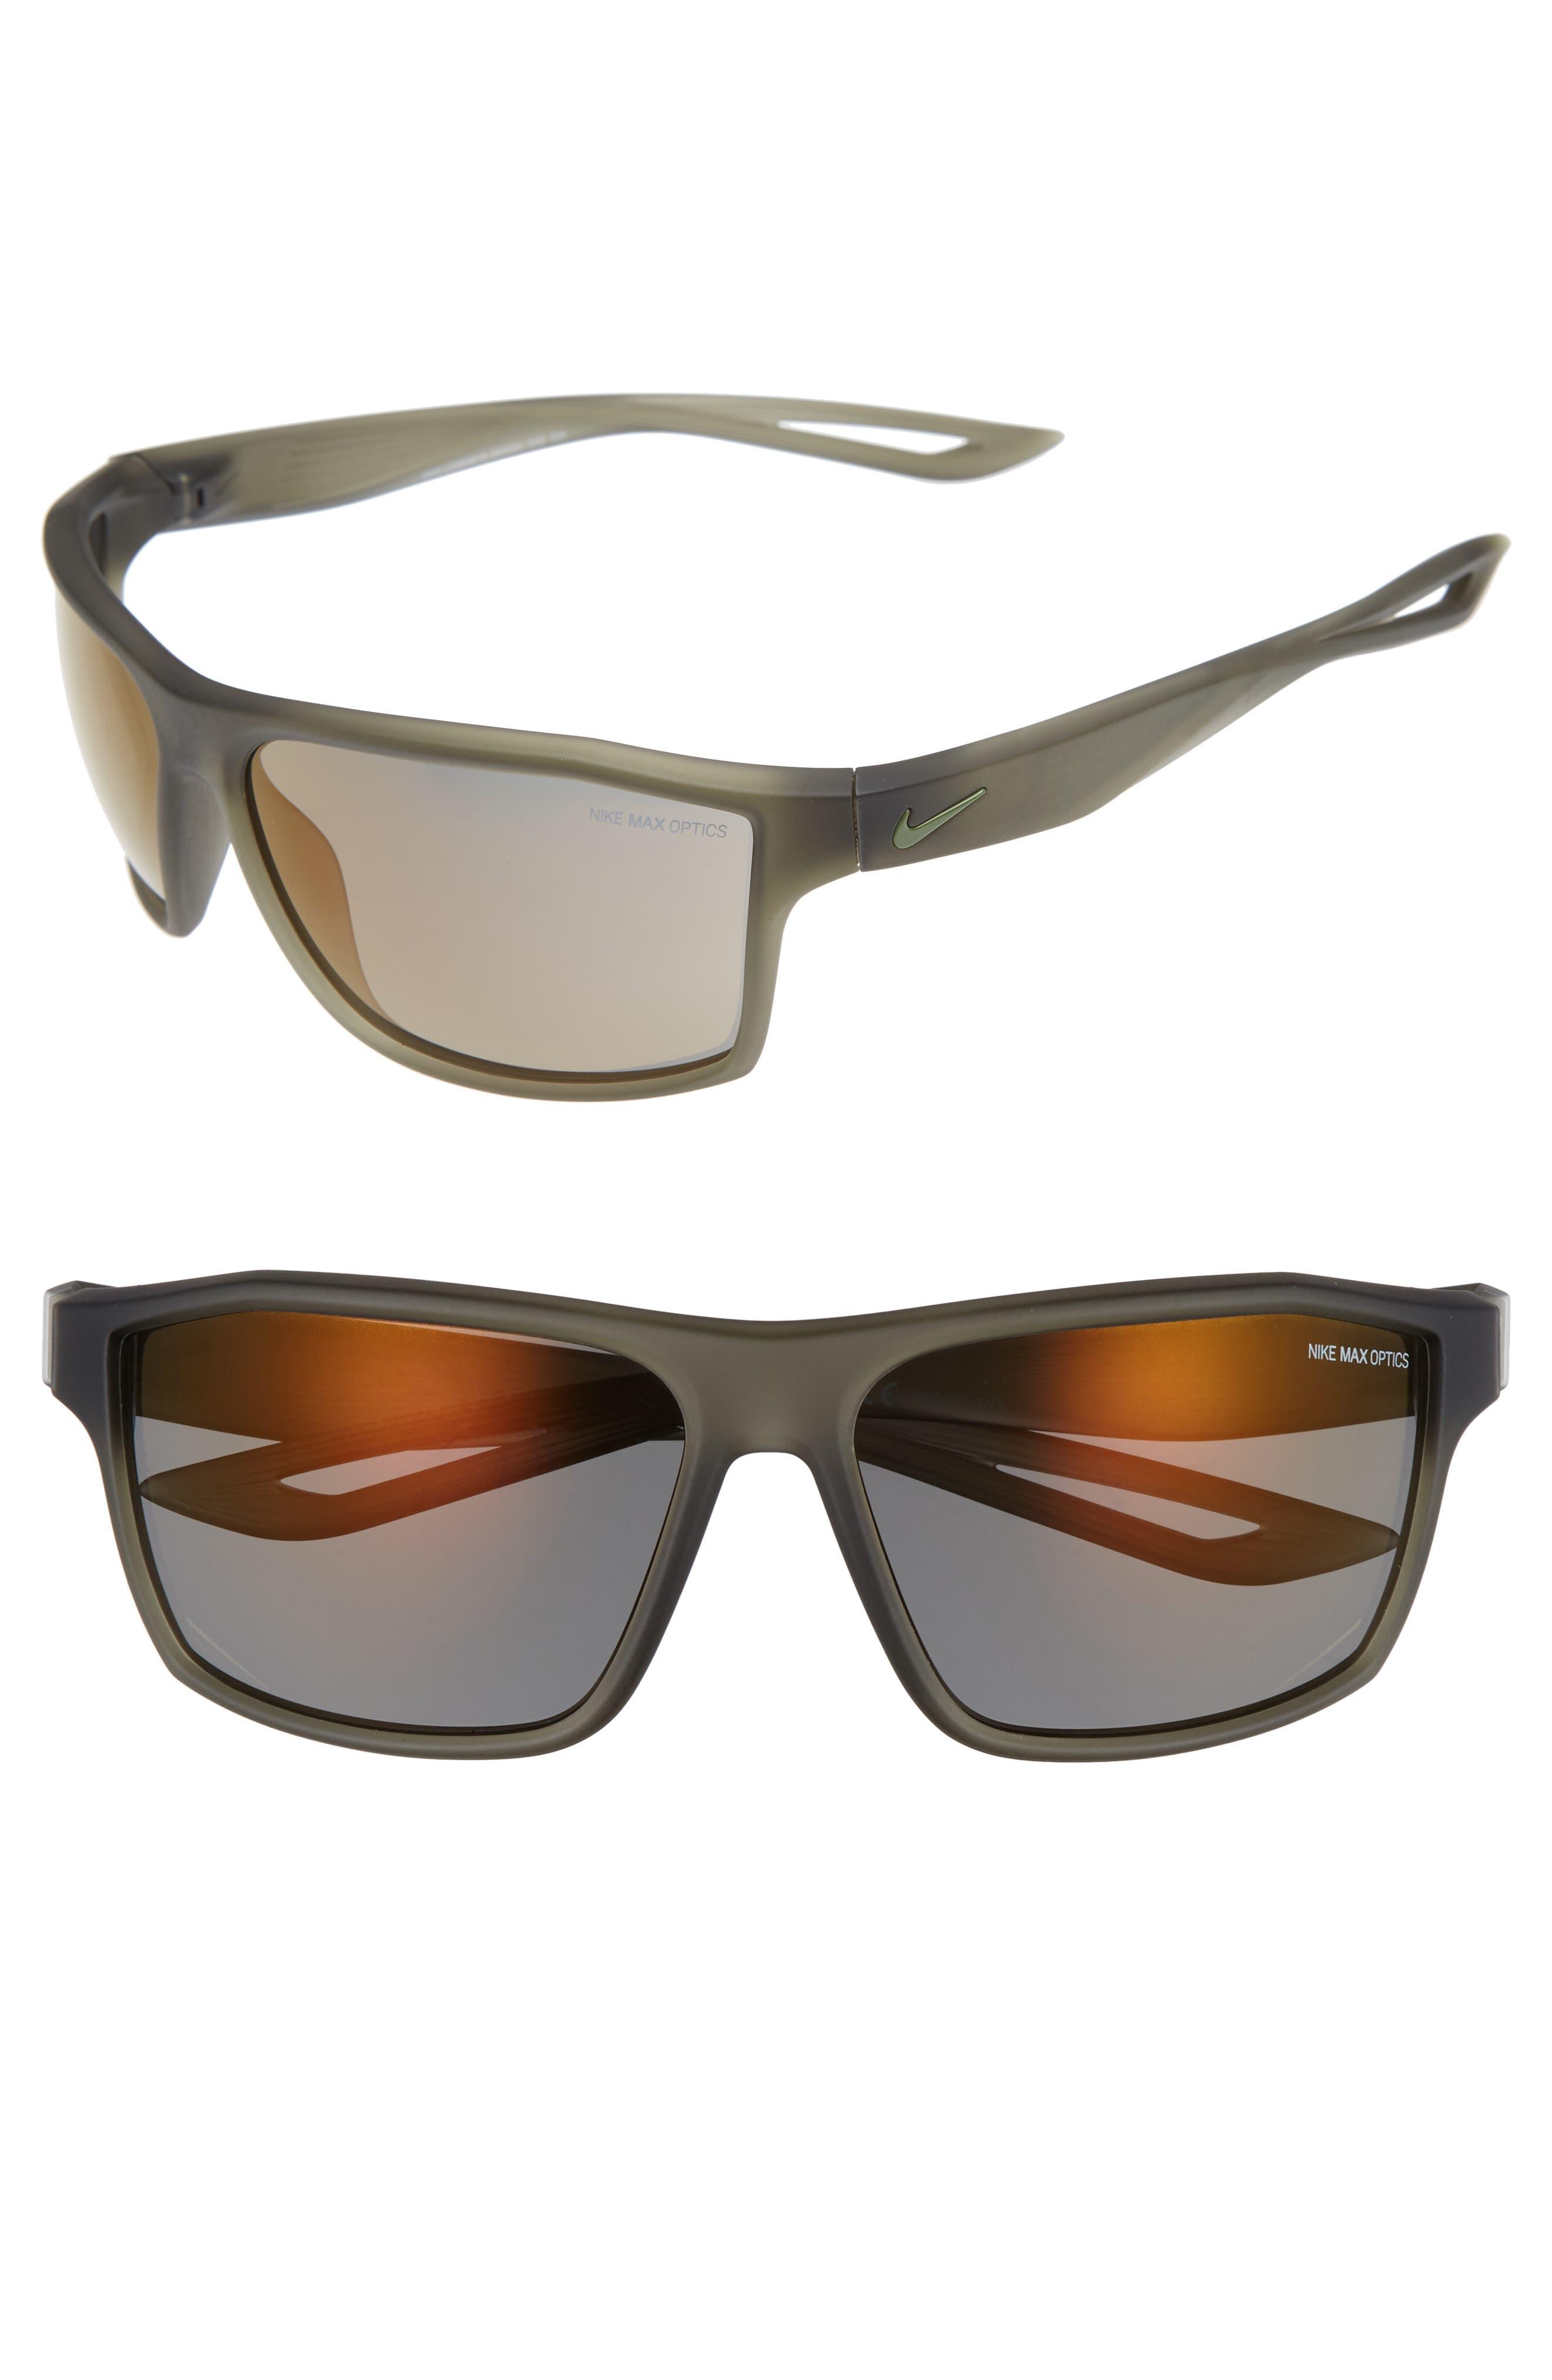 Legend 65mm Mirrored Multi-Sport Sunglasses,                         Main,                         color, Matte Cargo Khaki